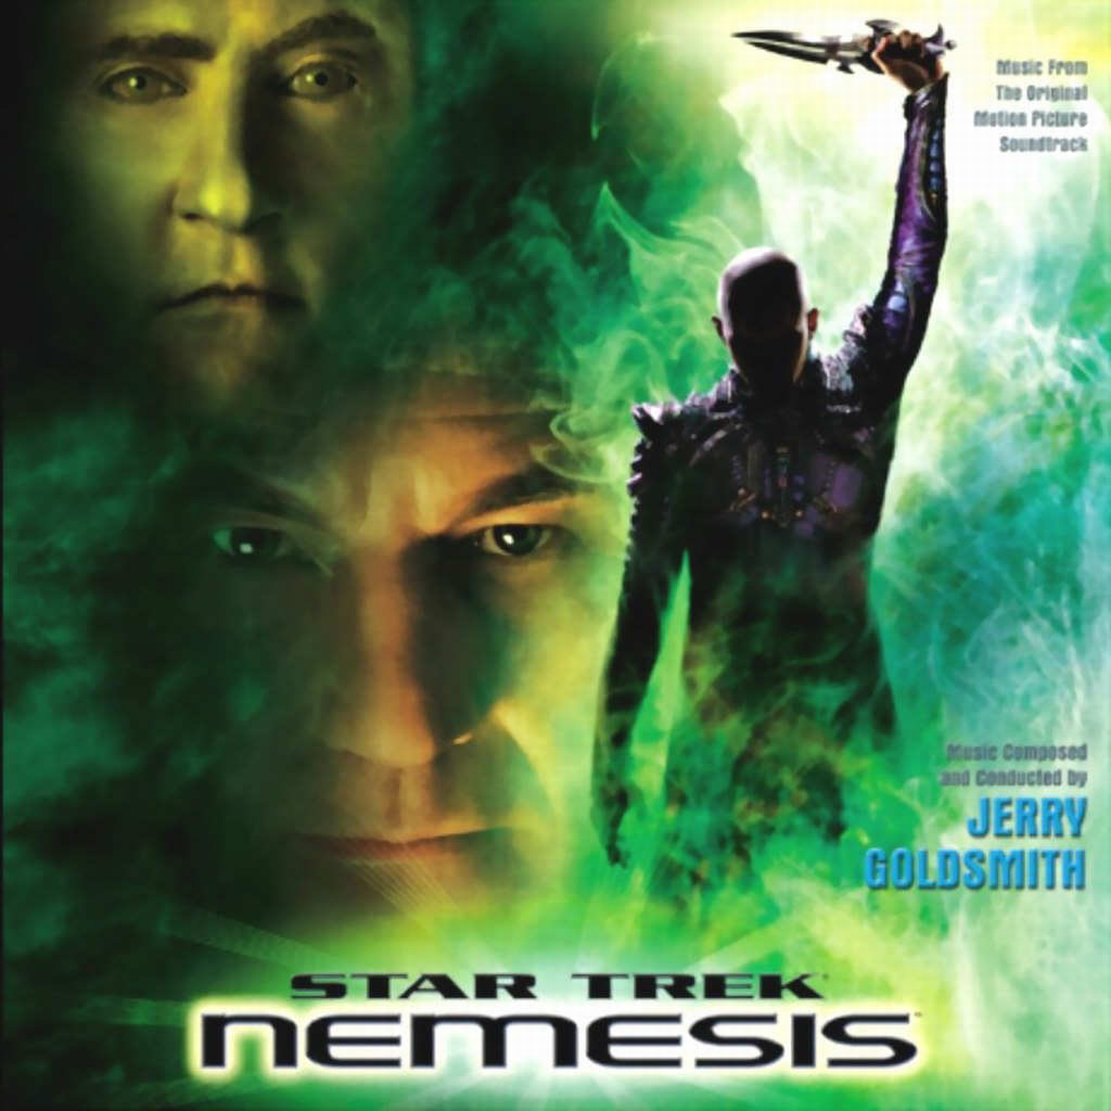 Star Trek: Nemesis (Soundtrack)